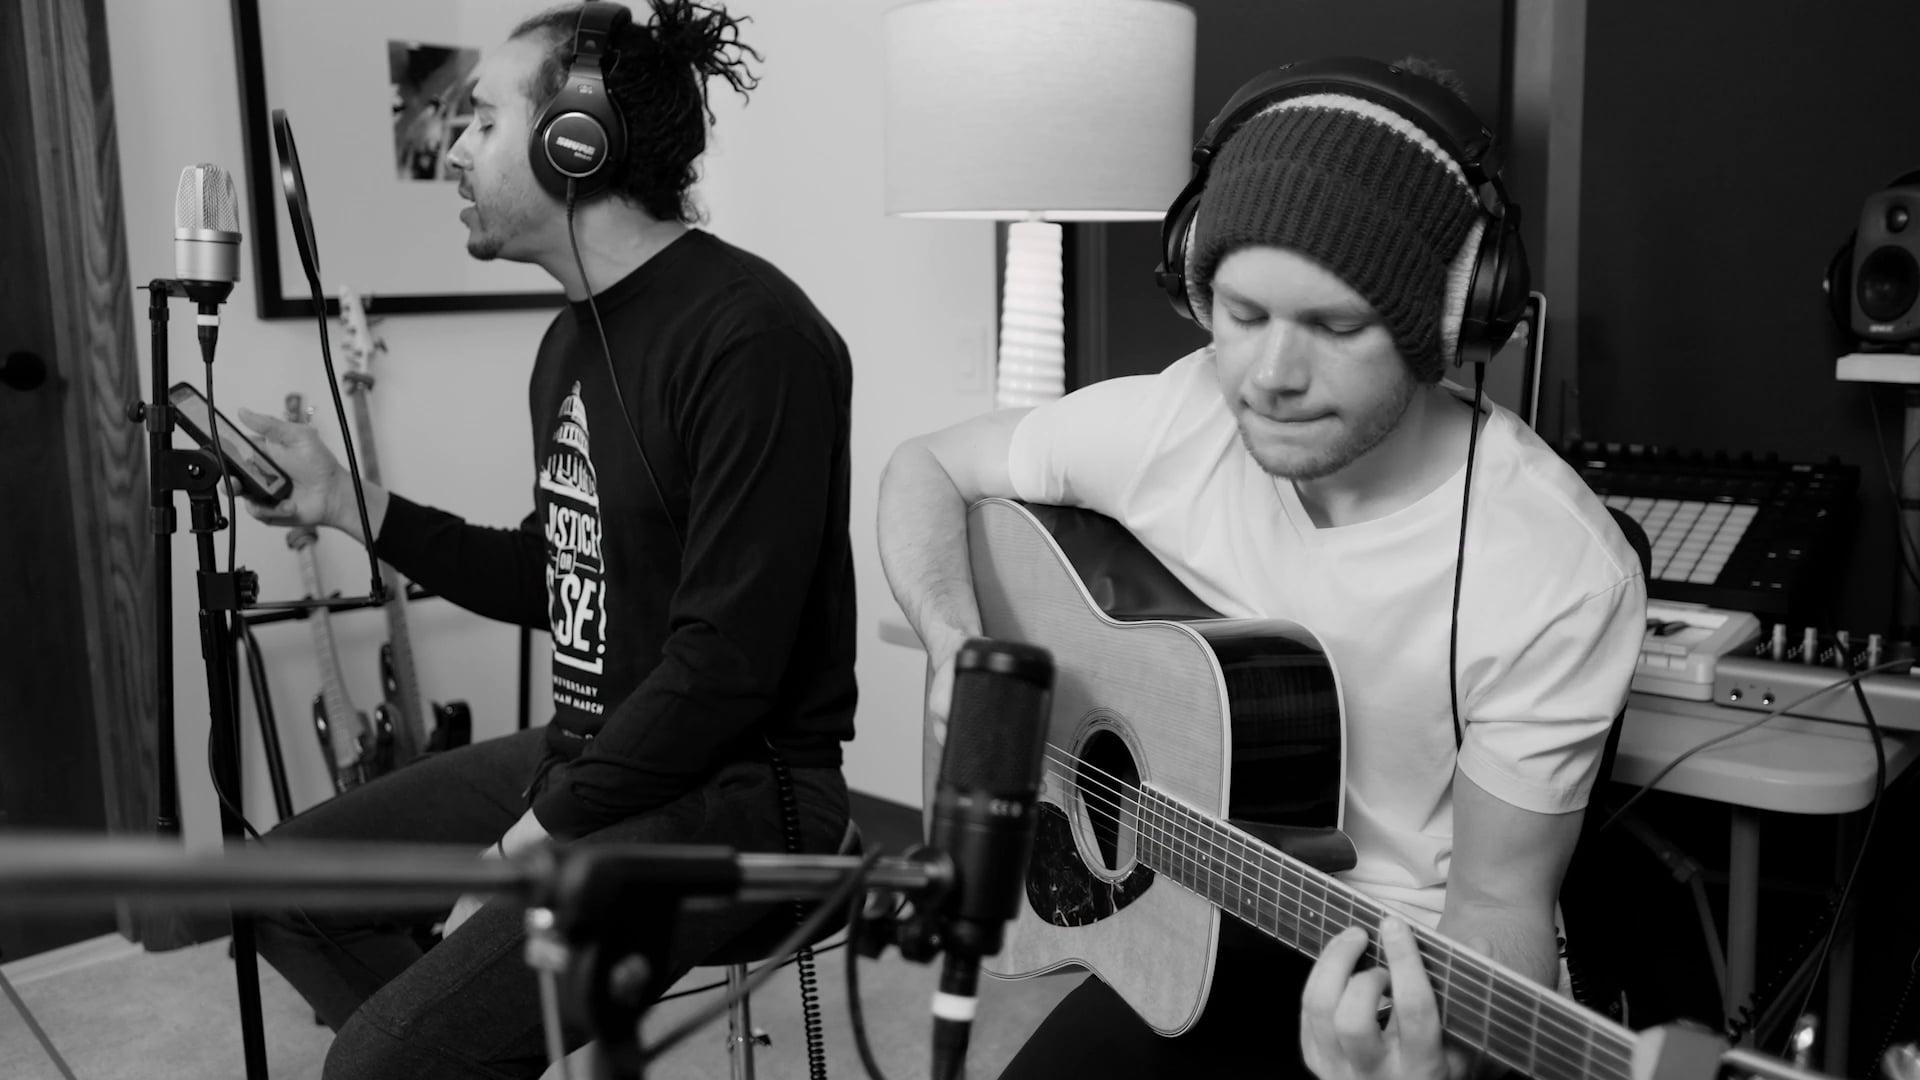 Prezence Acoustic Set: Welcome to JamRock